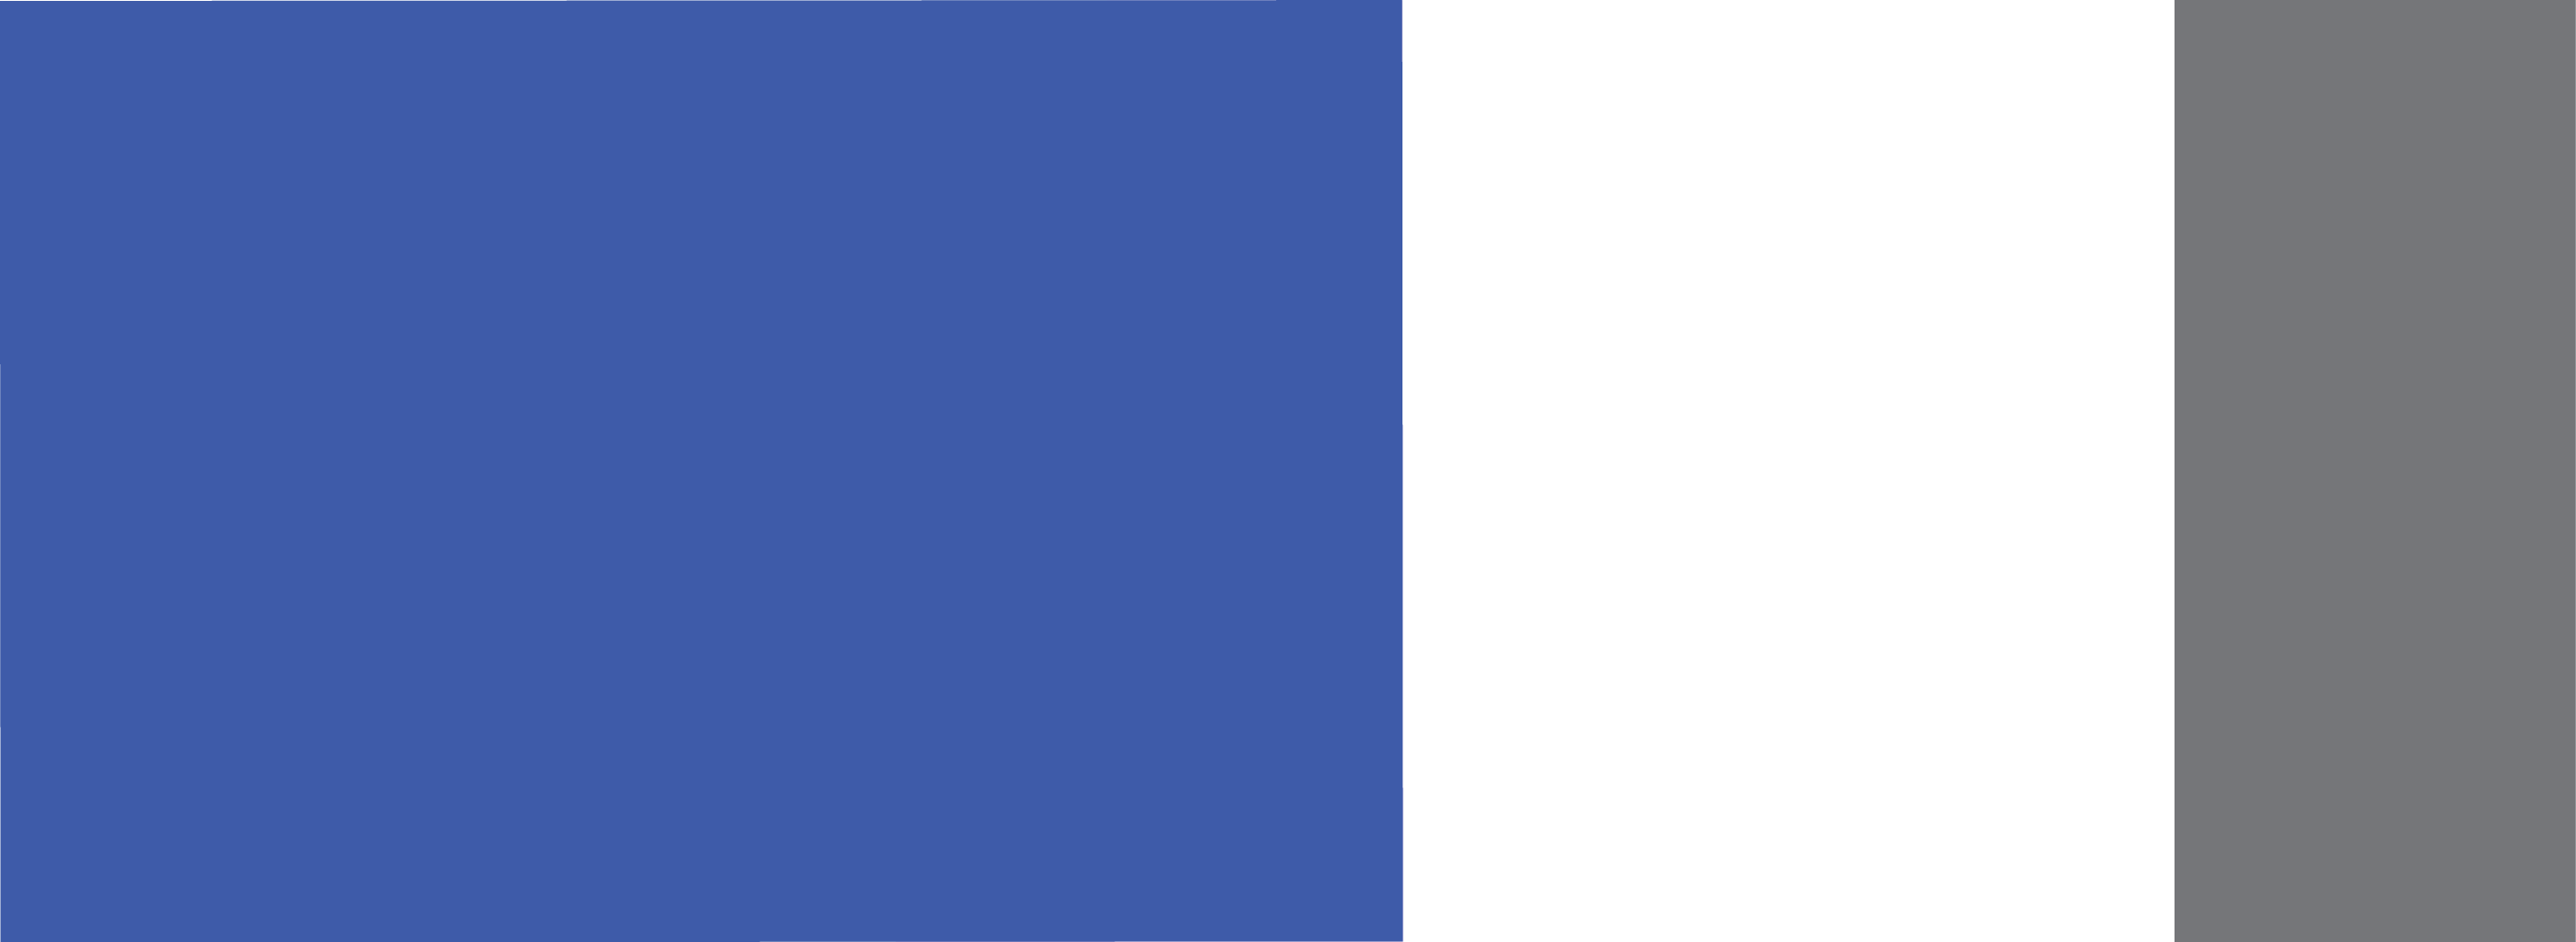 albastru alb gri